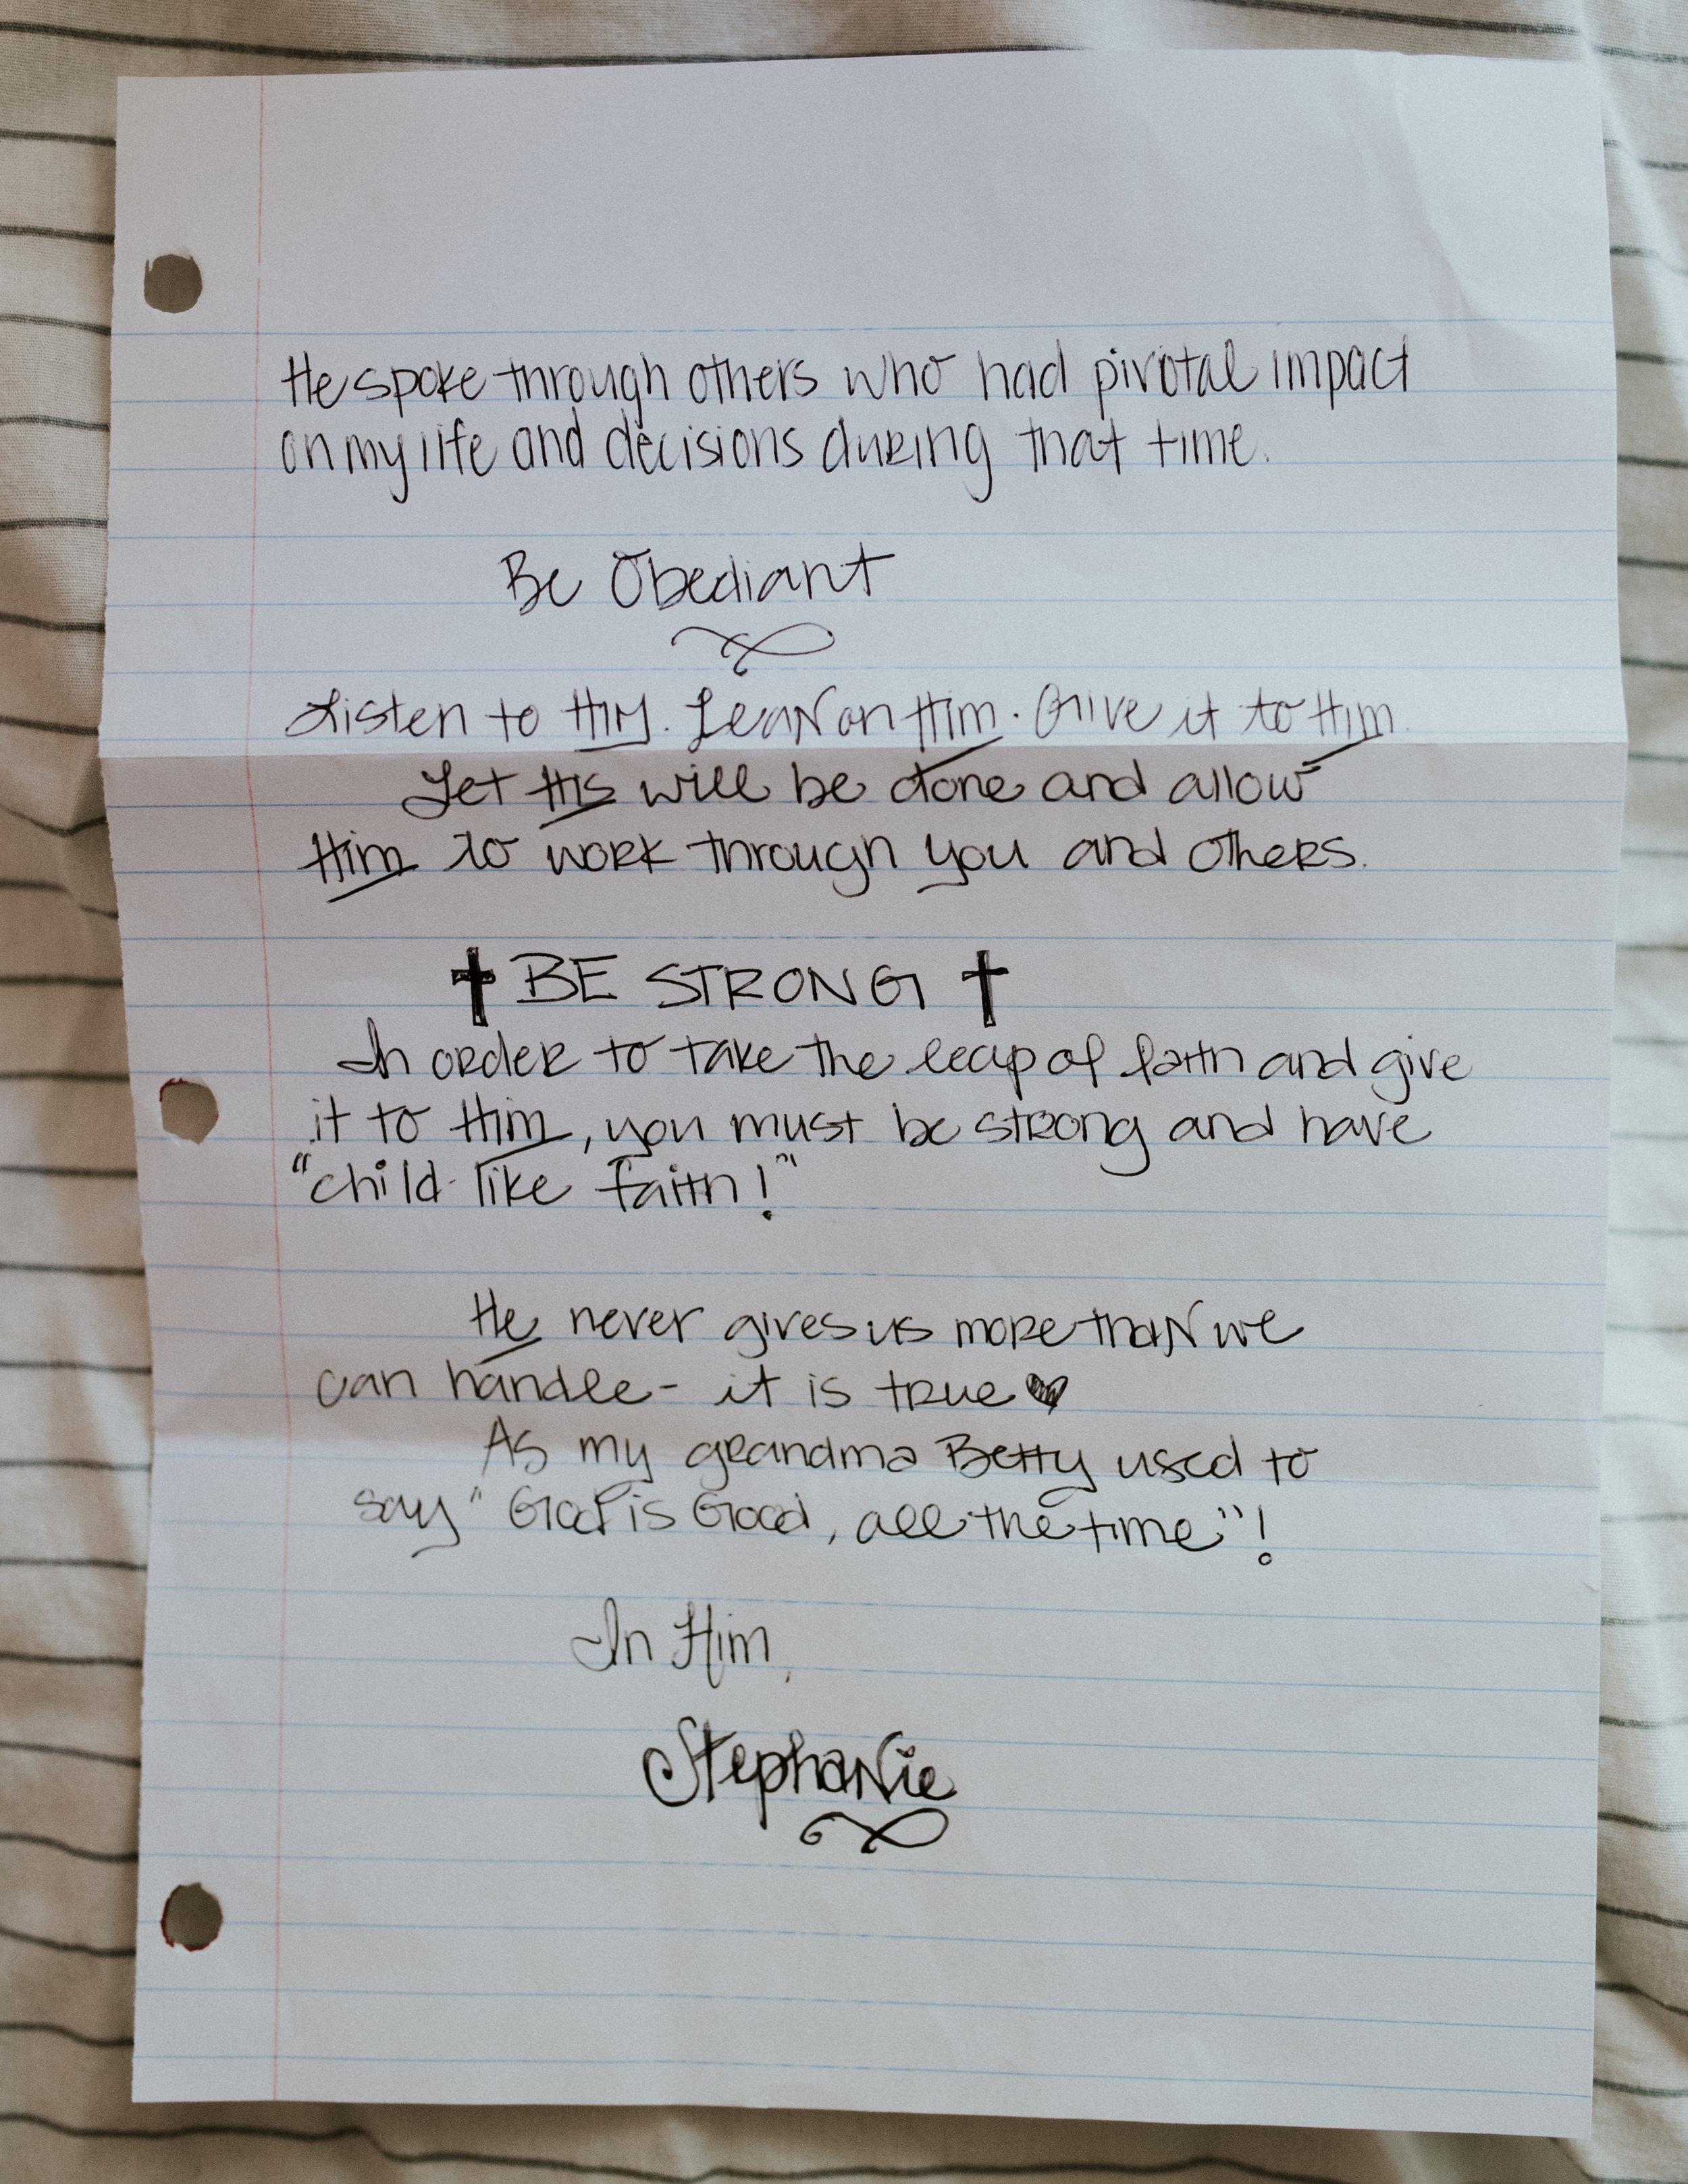 The-Catholic-Woman-Stephanie-Marmora-Letter-2